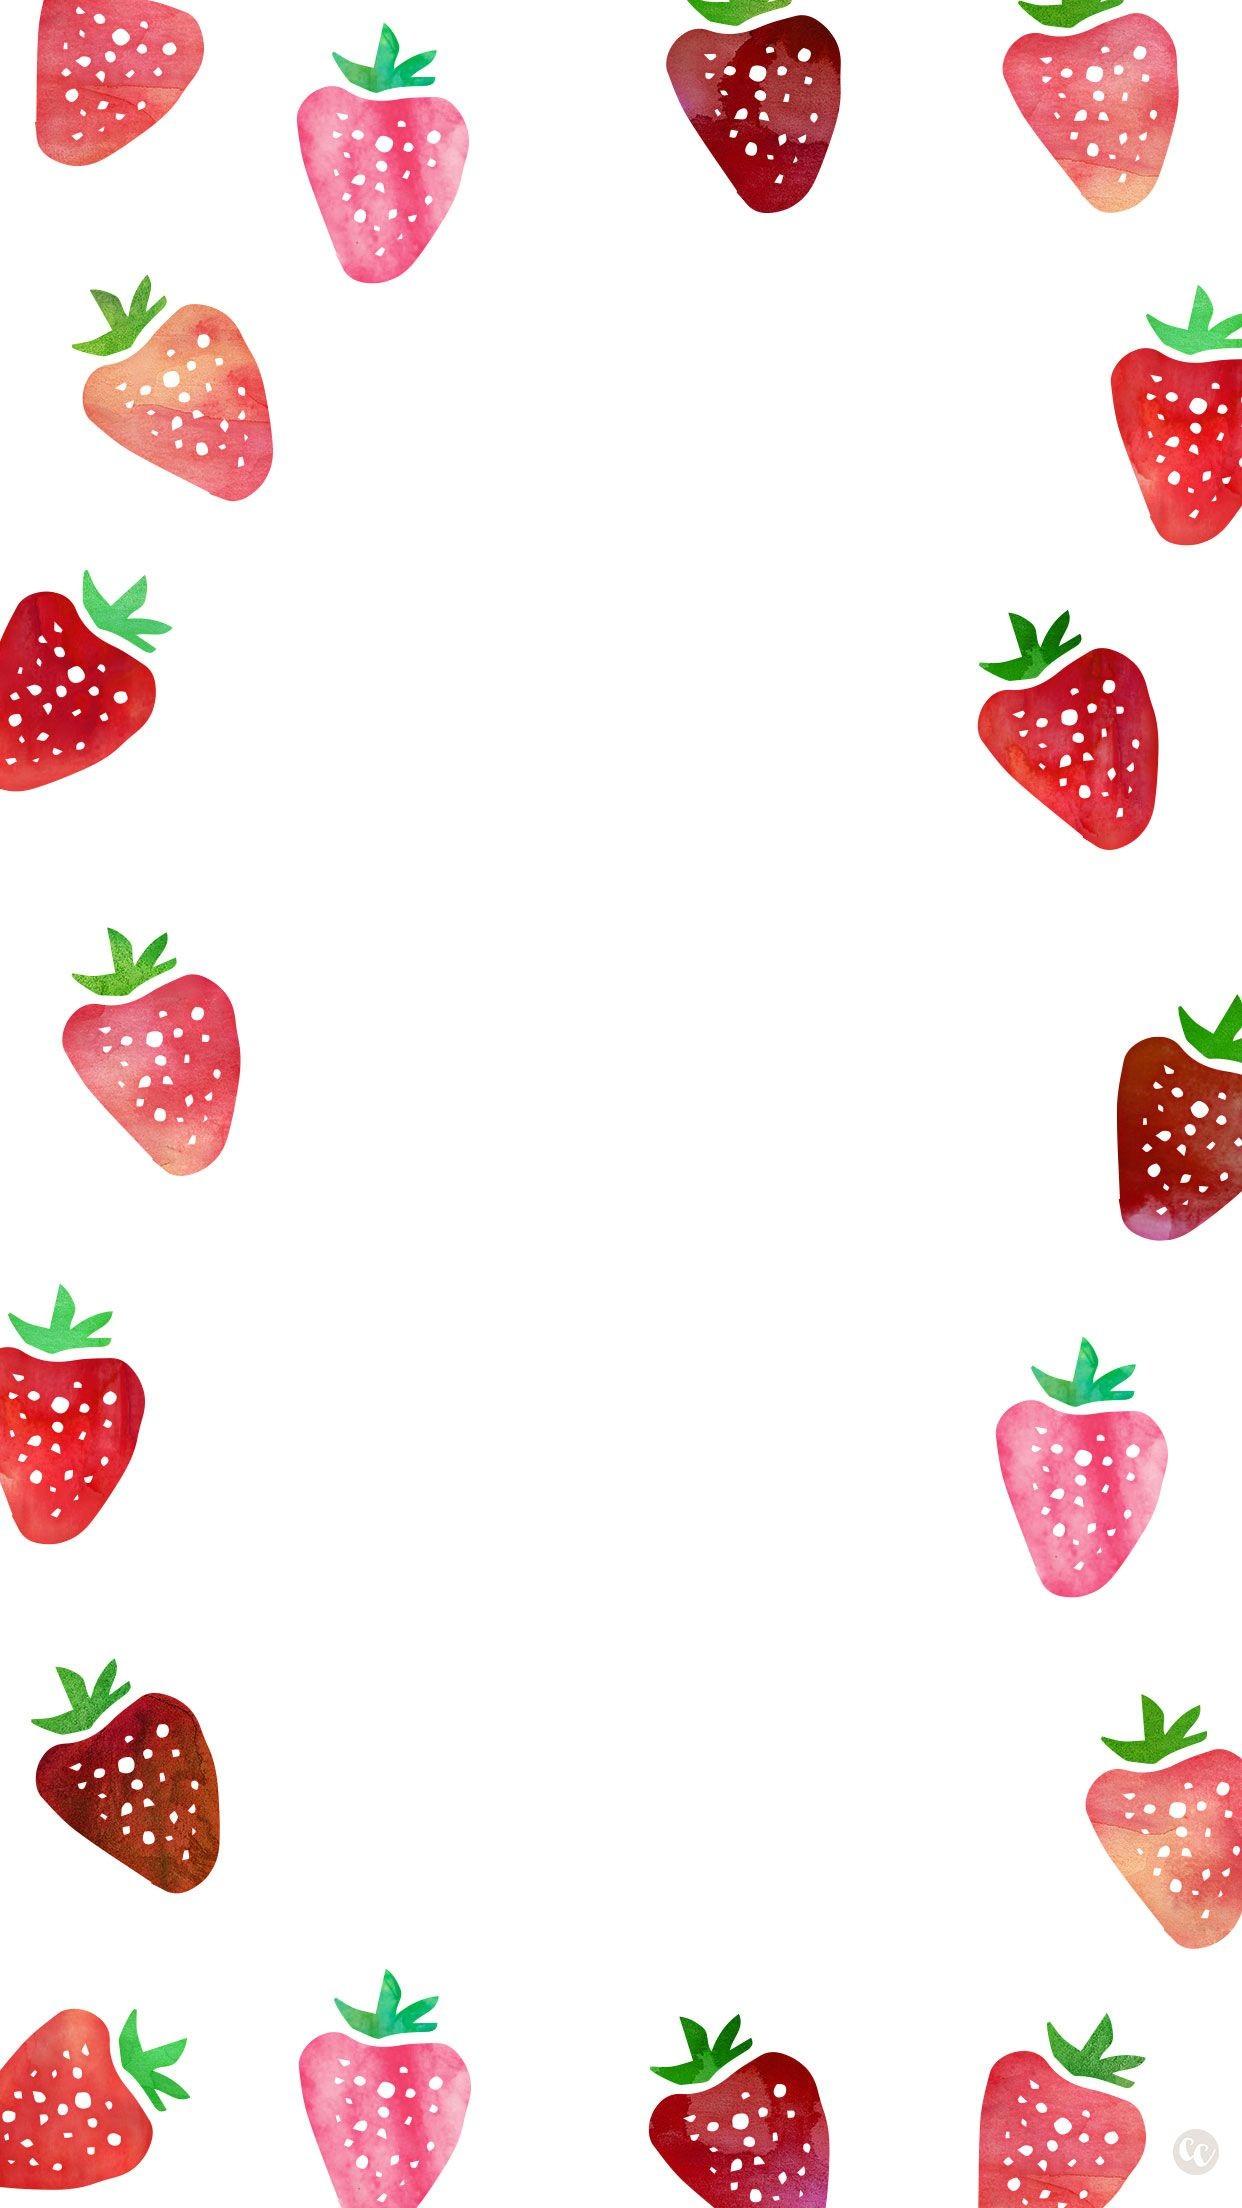 kawaii strawberry wallpapers. Strawberries clipart wallpaper